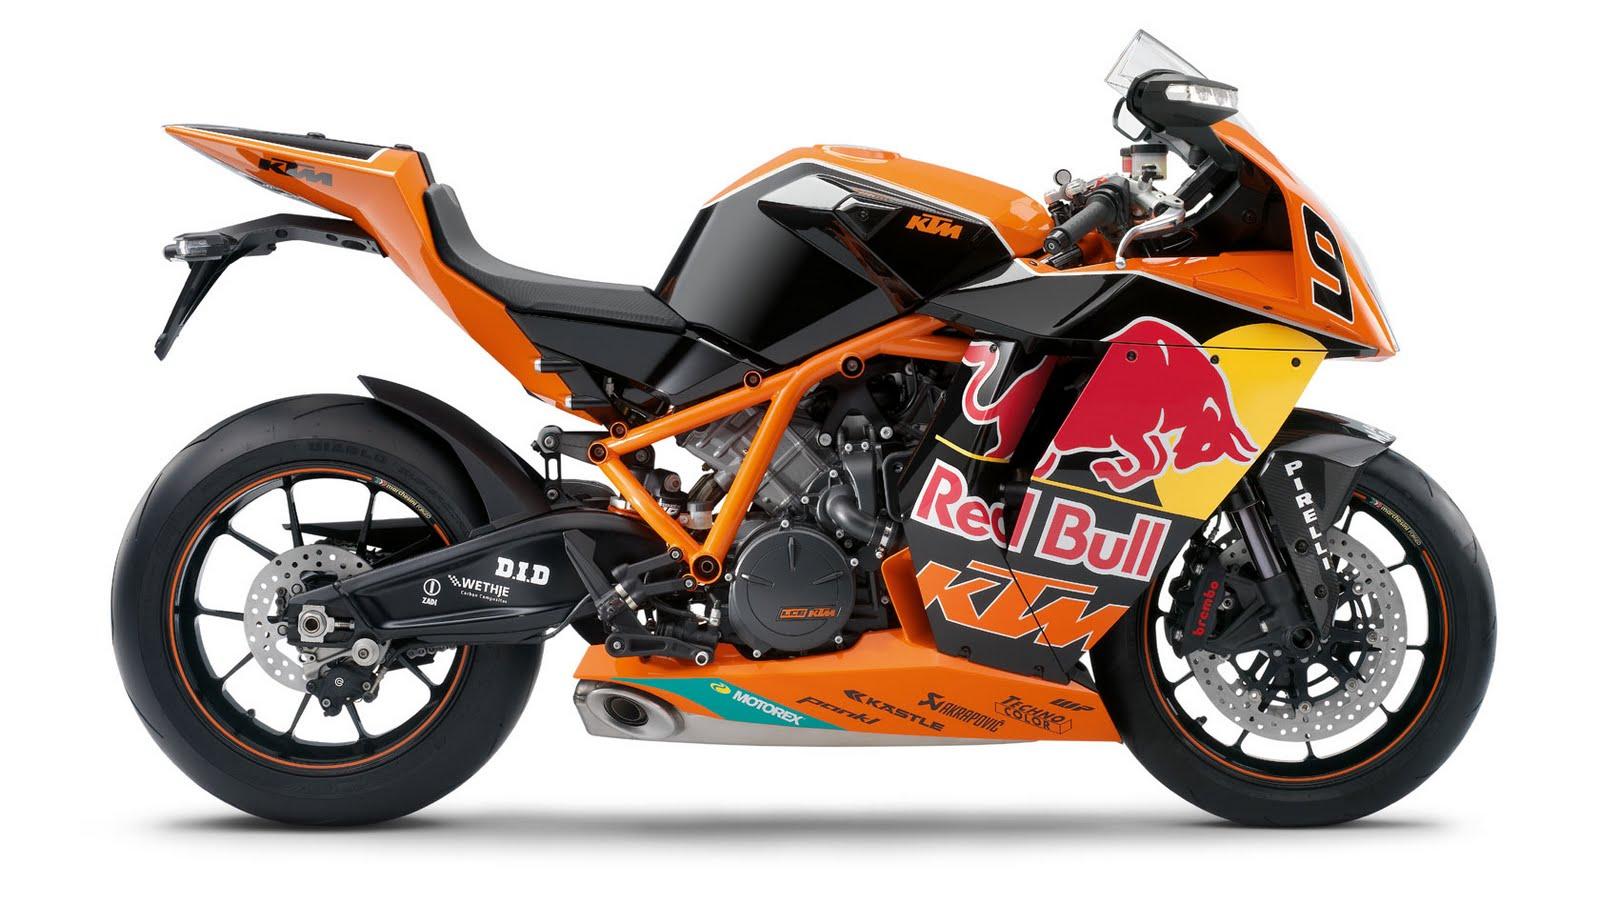 Red Bull KTM Motorcycles